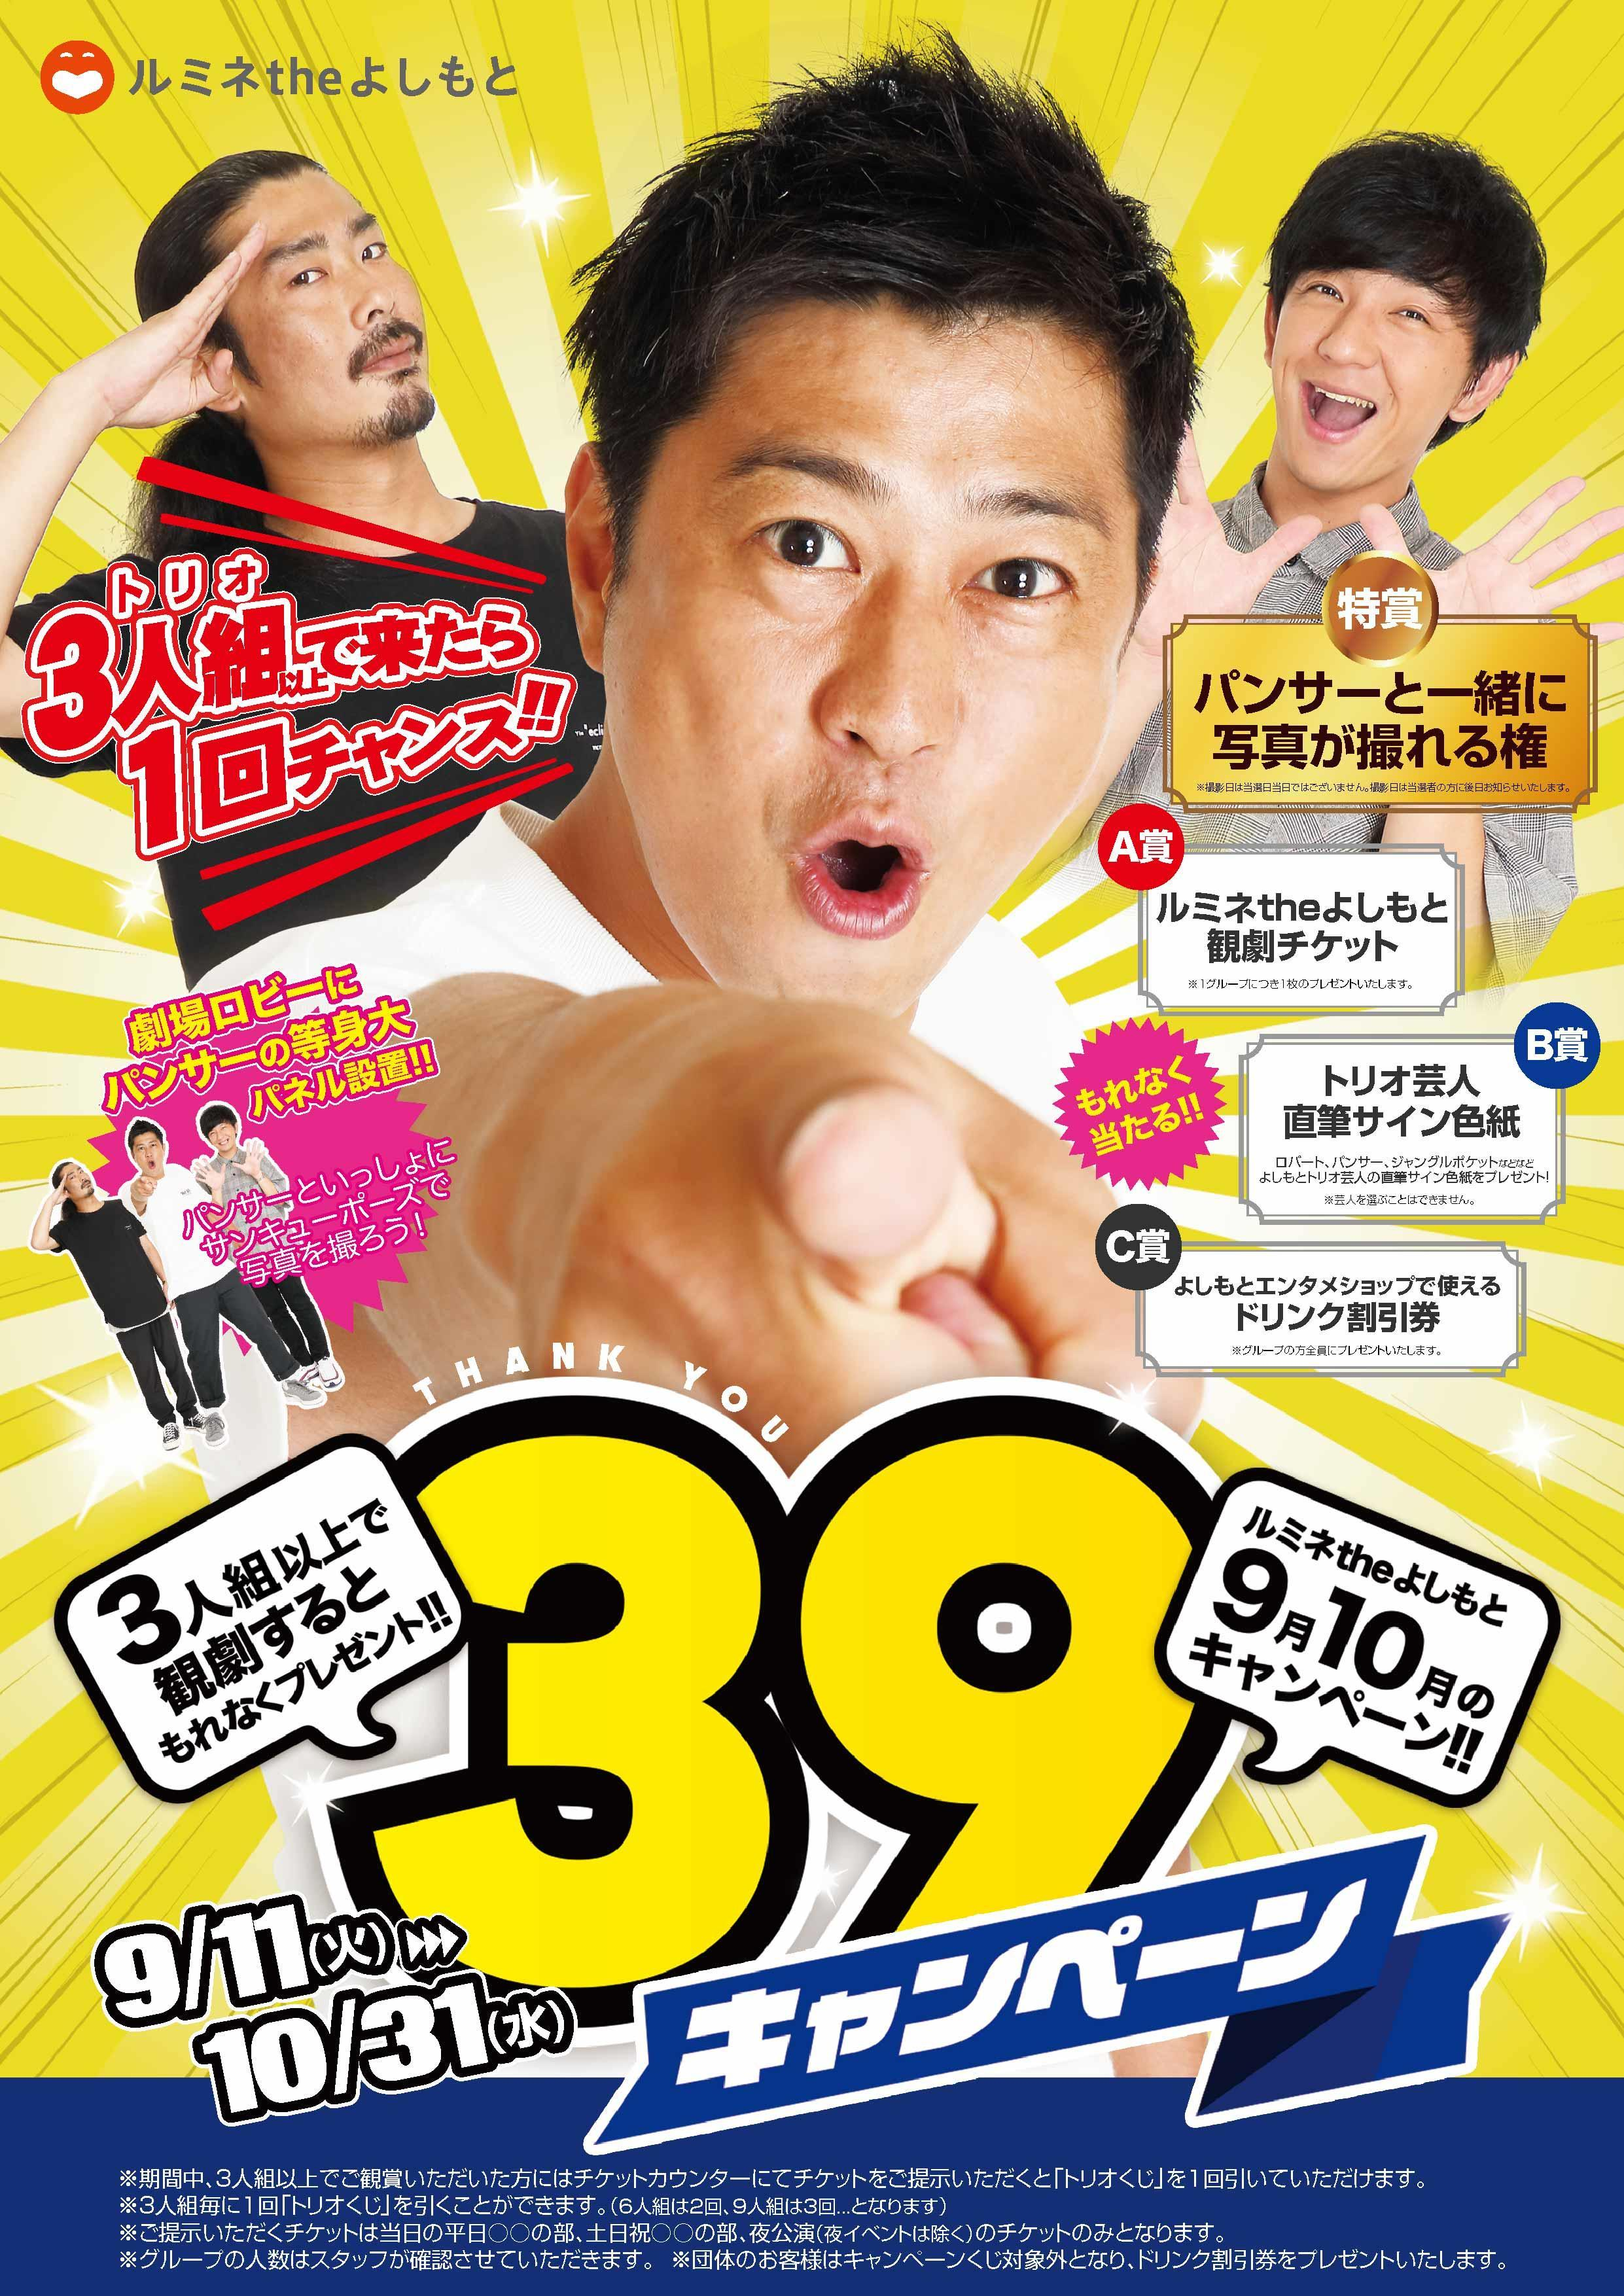 http://news.yoshimoto.co.jp/20181010150944-9220186396e7fdafba679acea03266ebb1f211c2.jpg